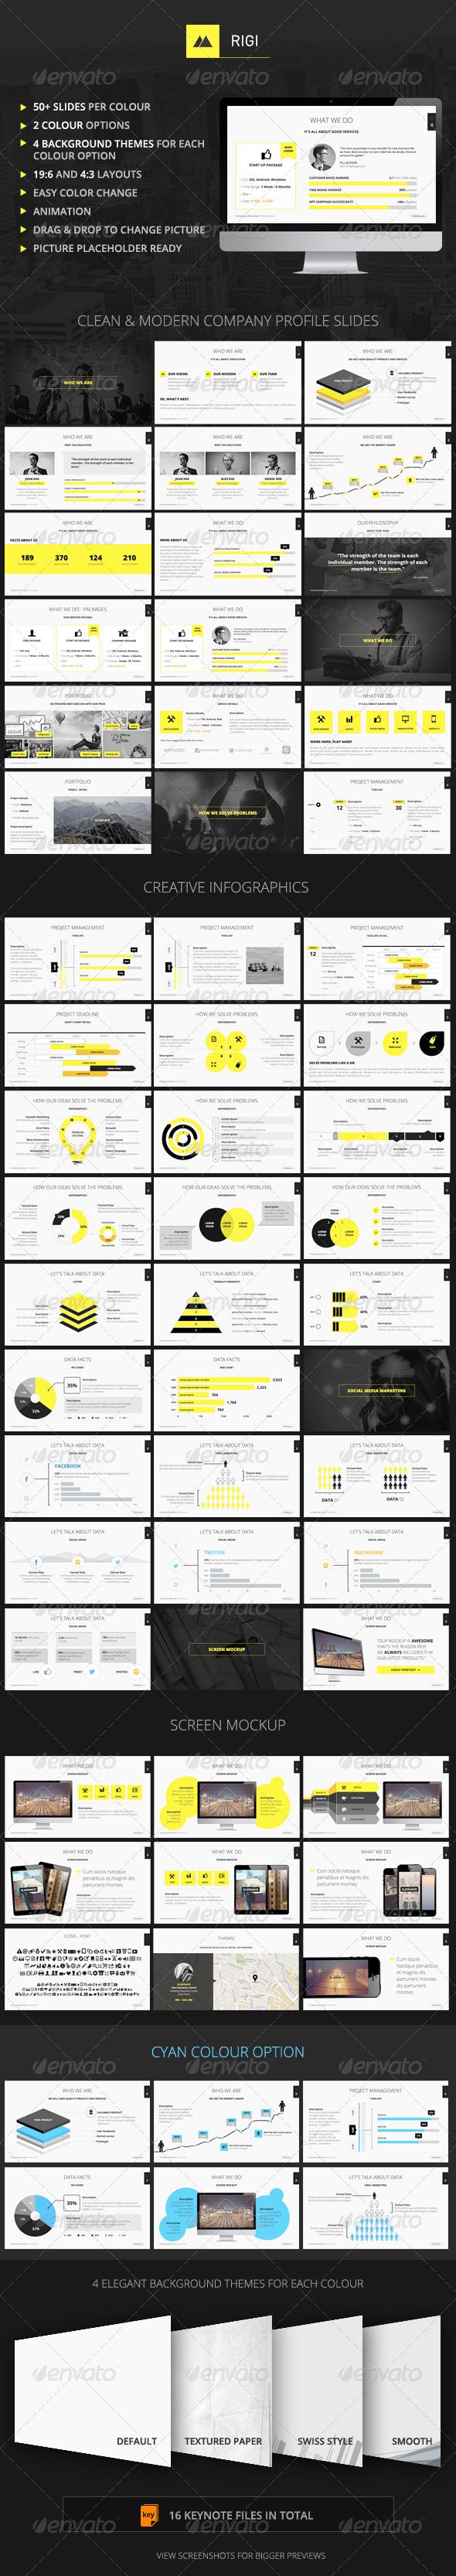 GraphicRiver RIGI Keynote Template 6928908